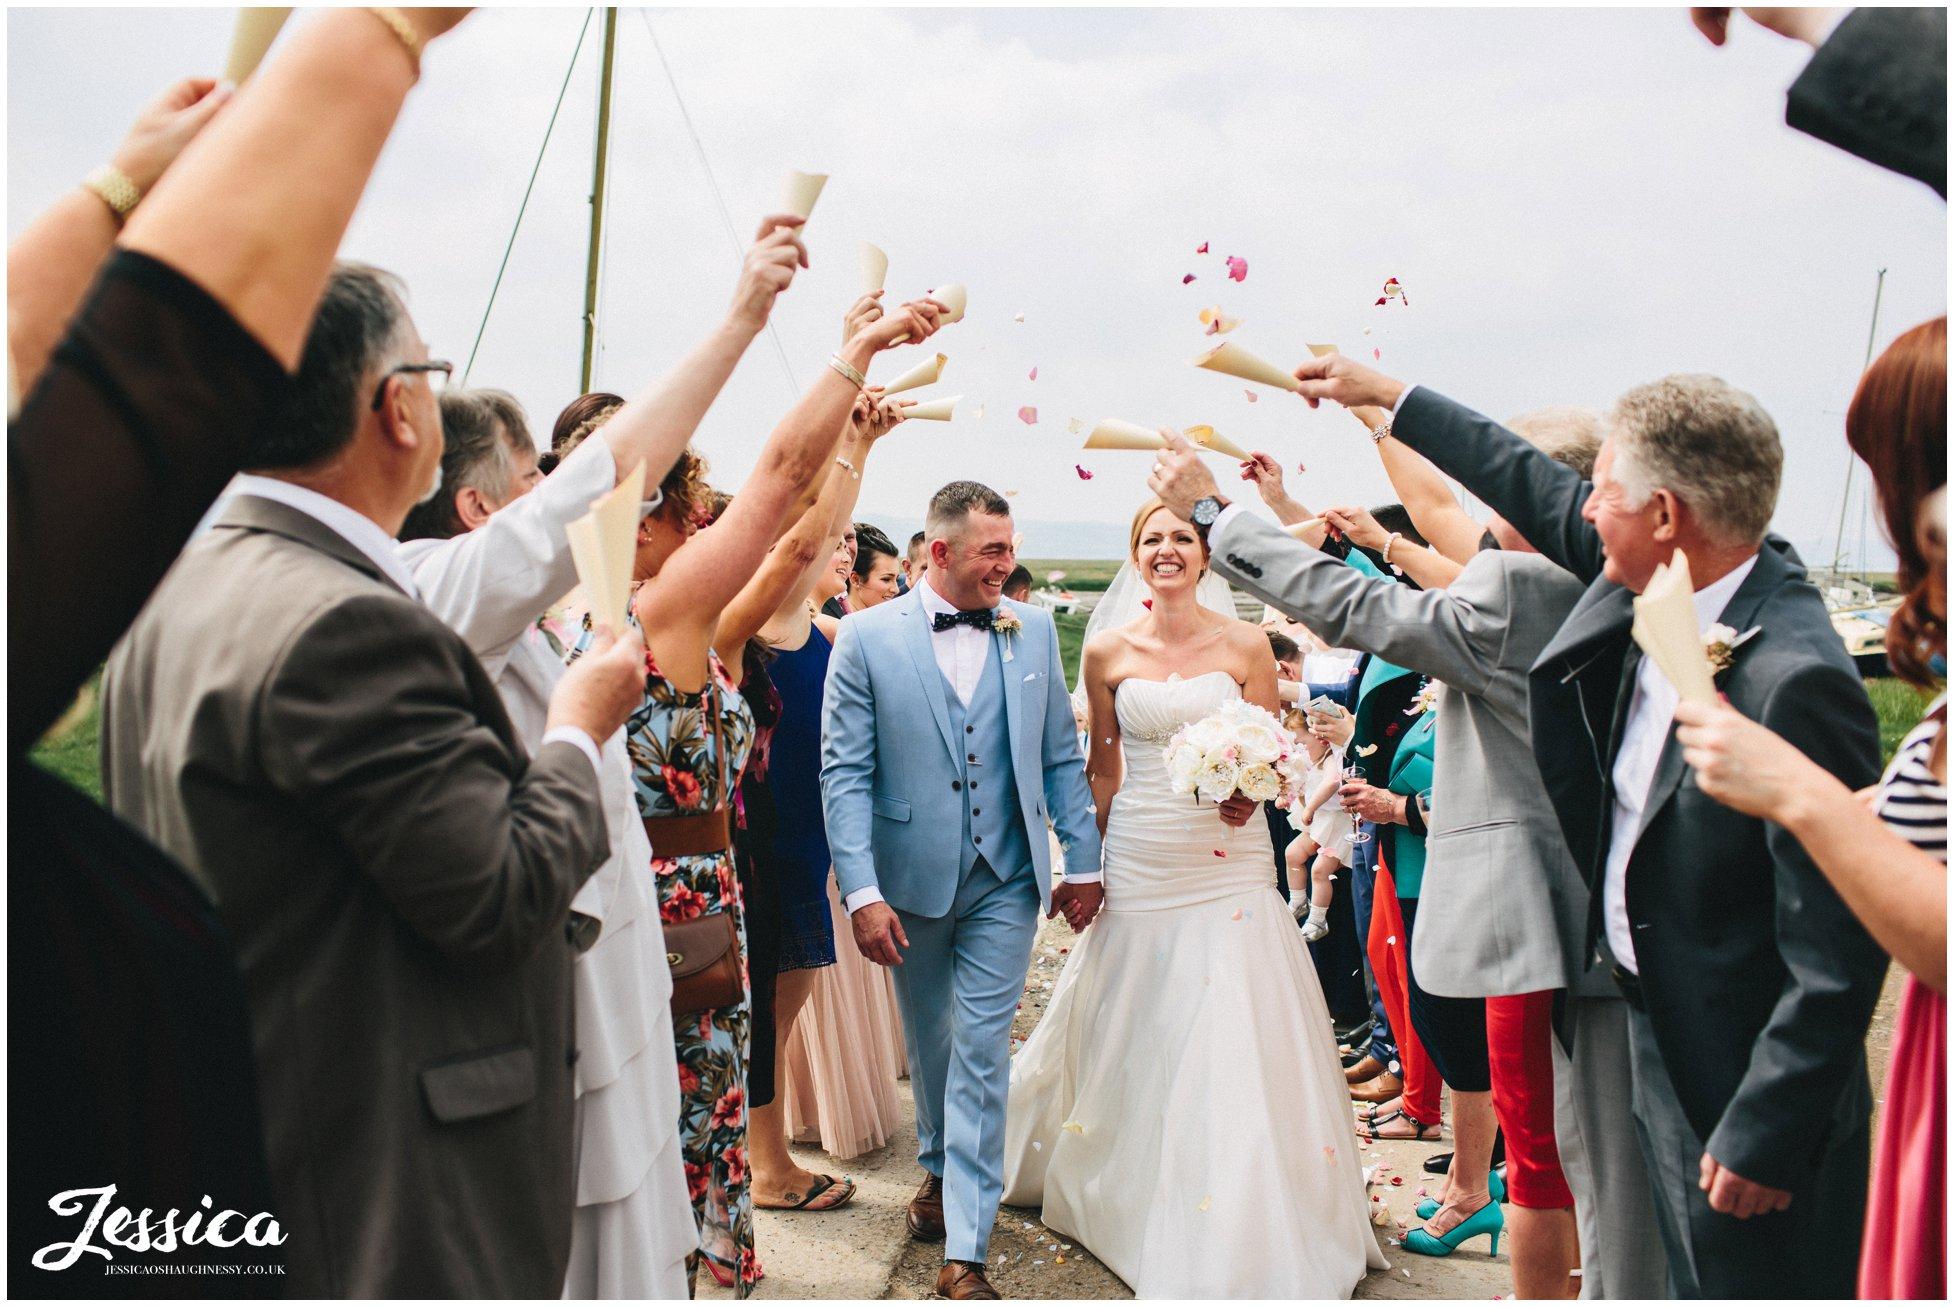 couple walk through the confetti line at their wirral wedding